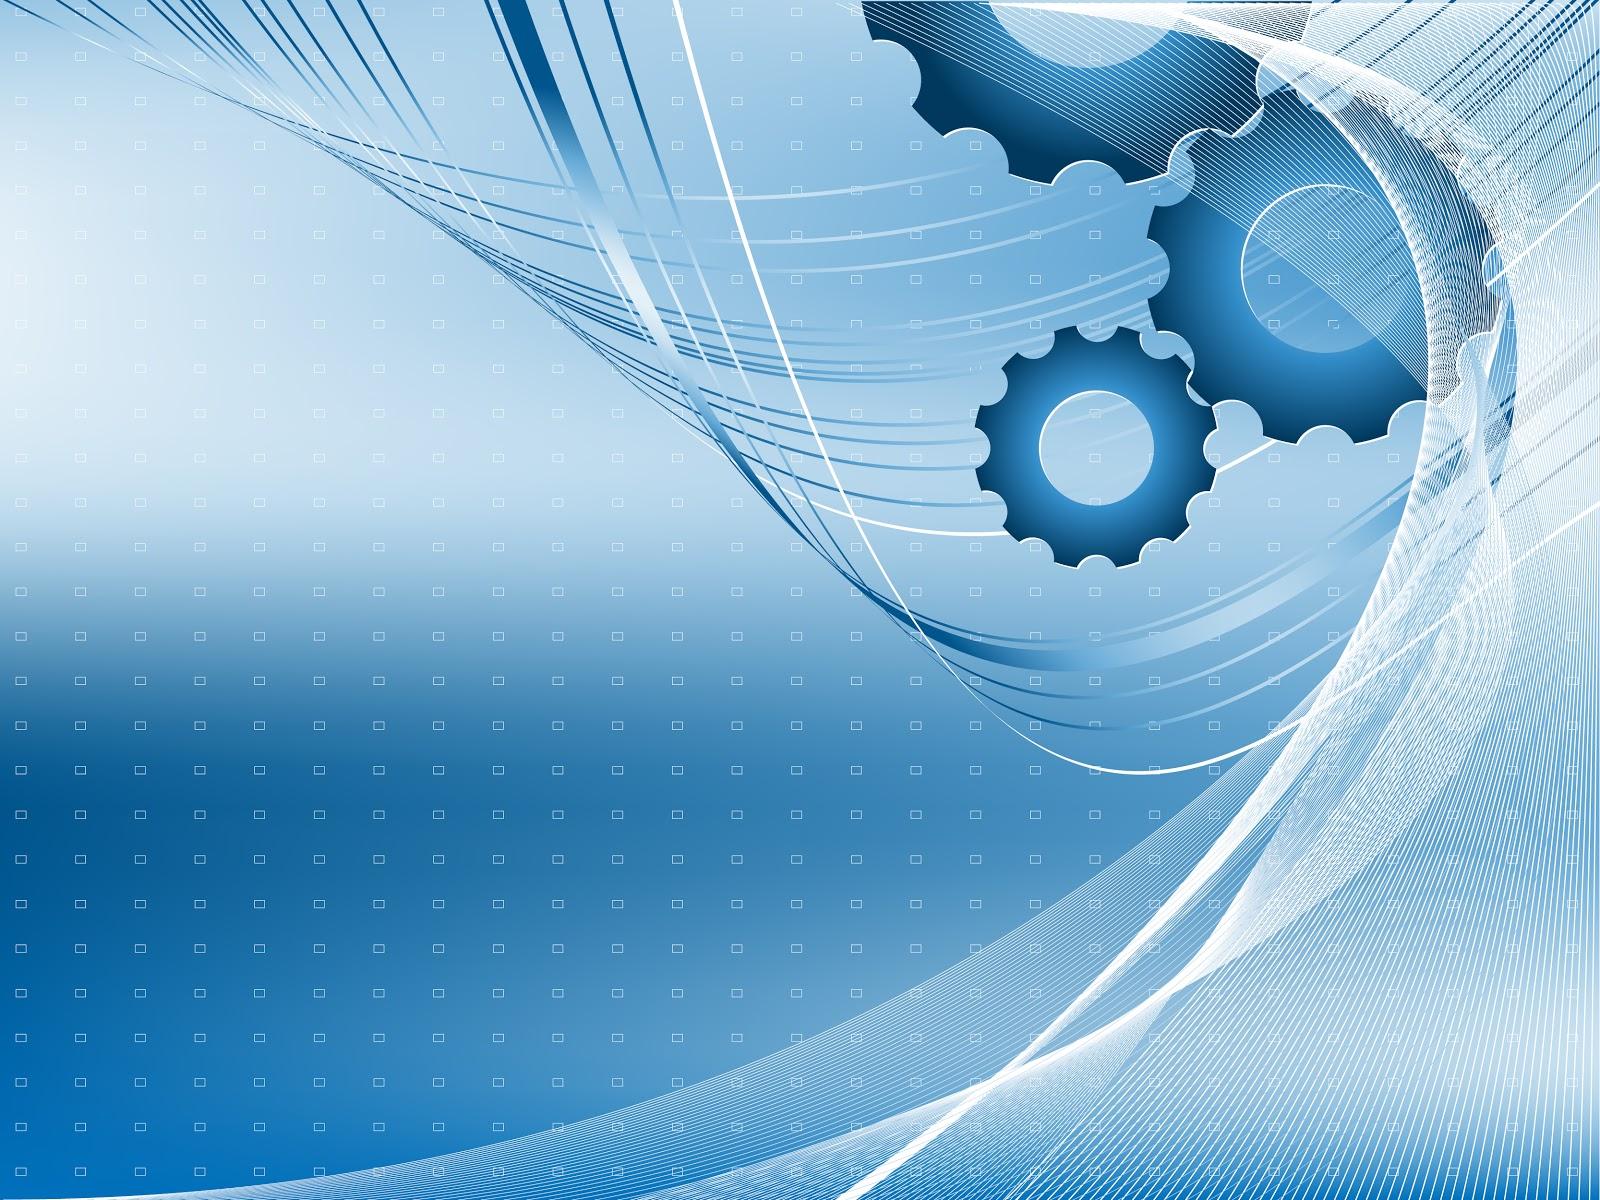 Technology Background Images - WallpaperSafari